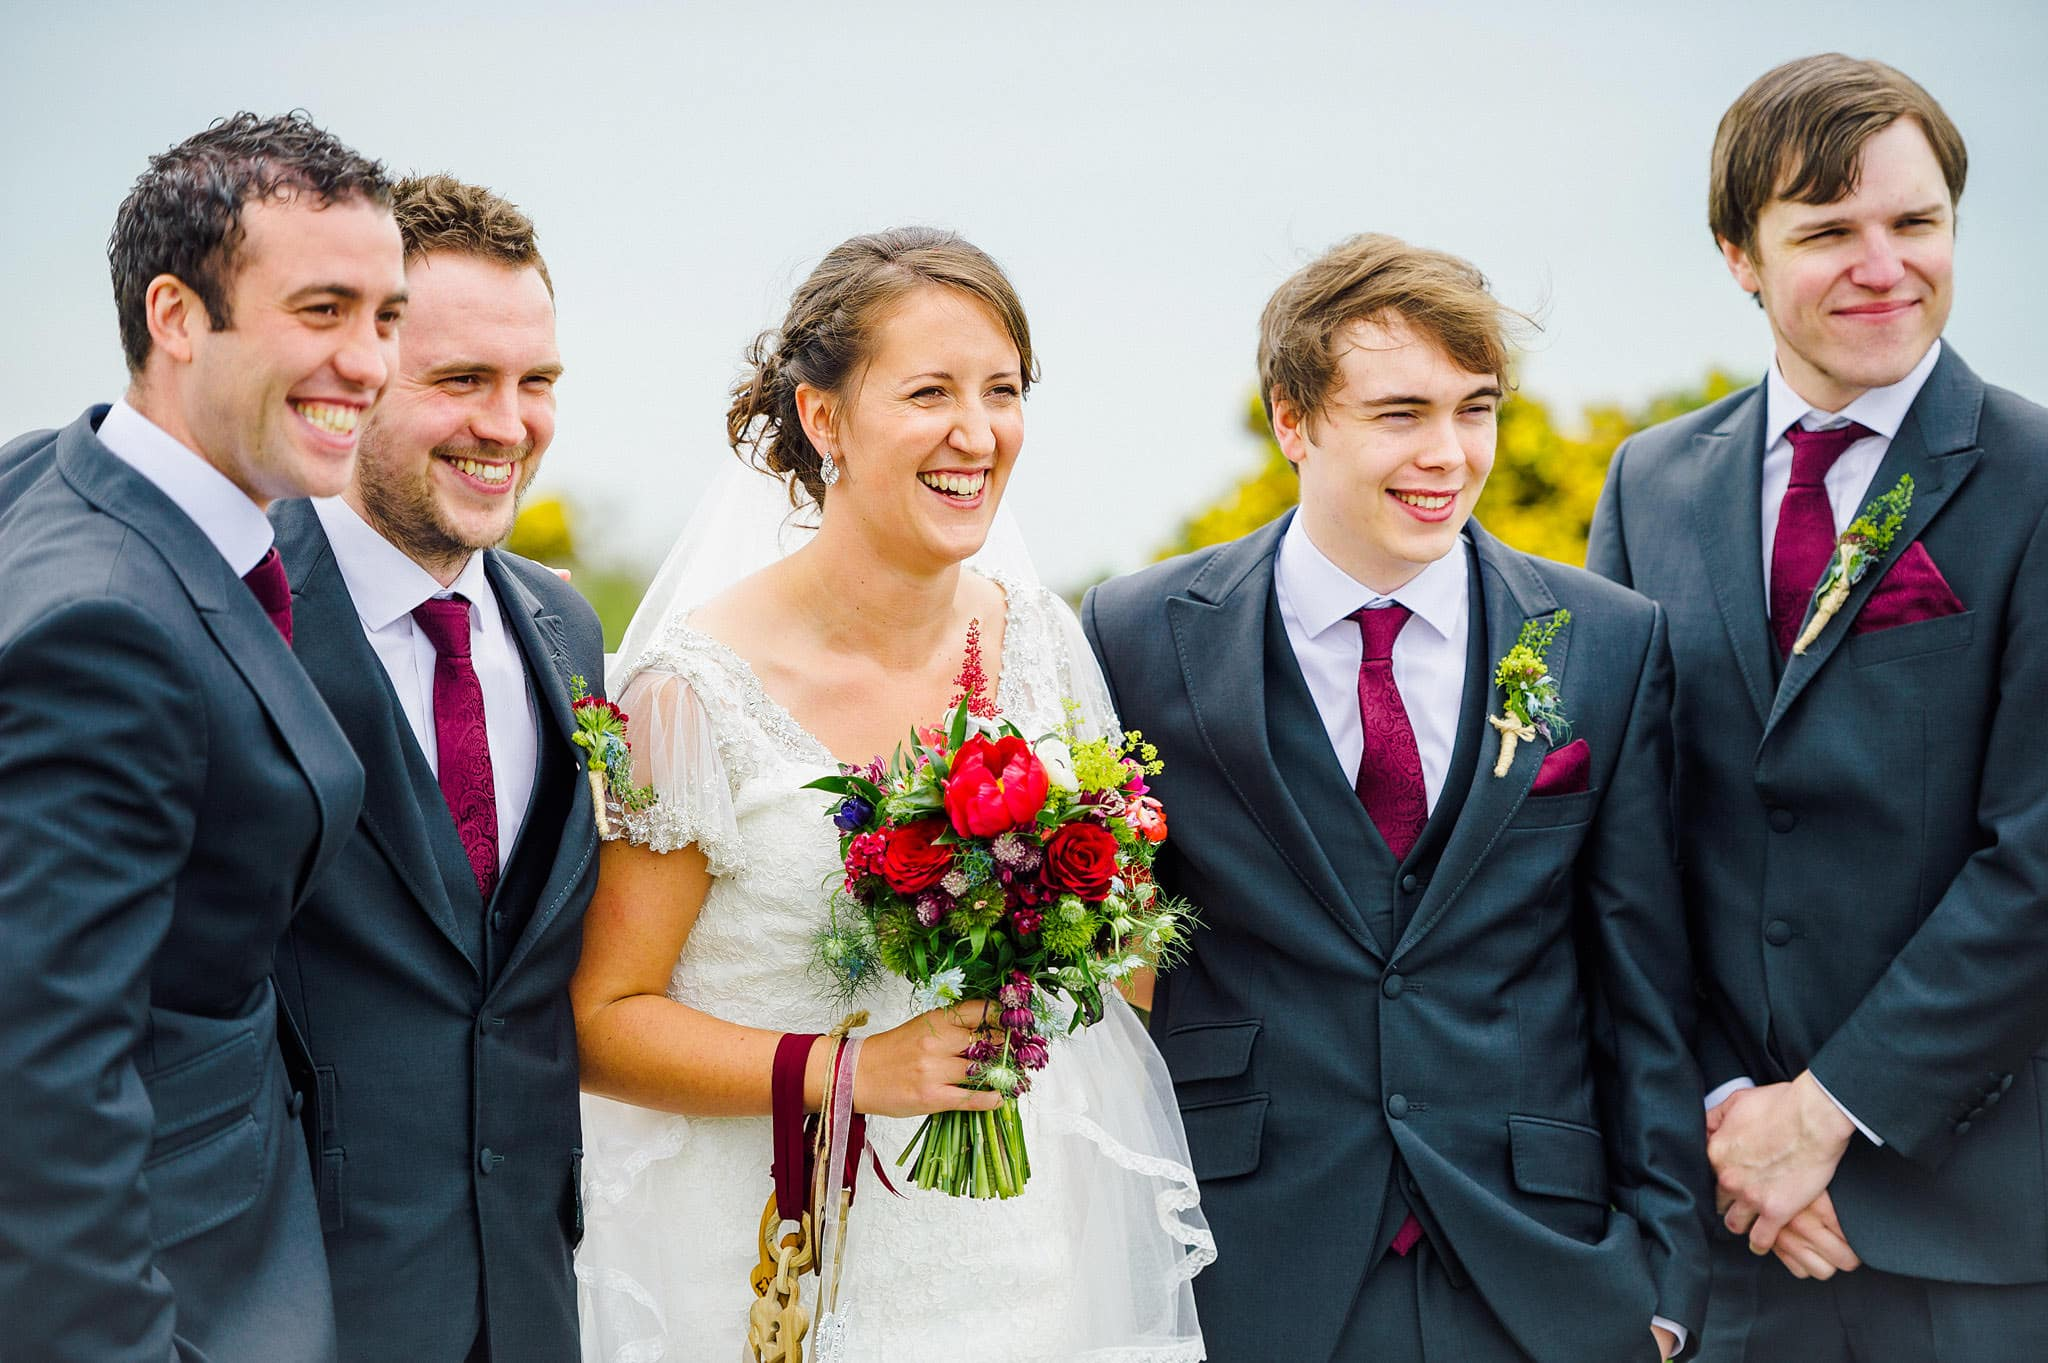 wedding-photographer-aberystwyth-wales (156)